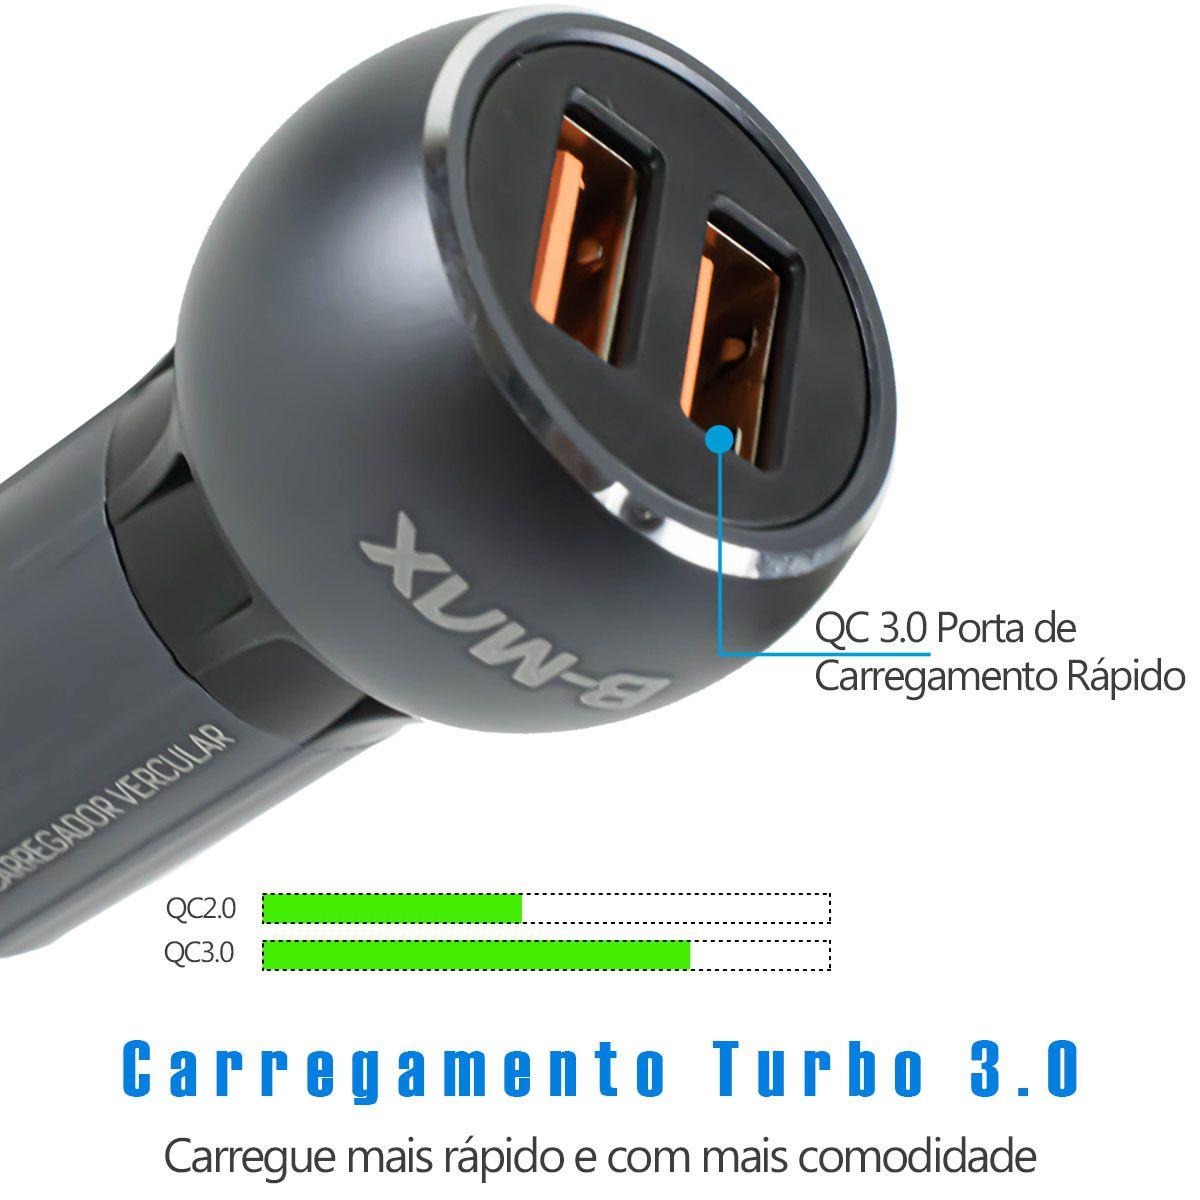 KIT 2x Carregador Veicular Turbo Quick Charge 3.0 36w para Celular Micro Usb V8 B-Max BM8610